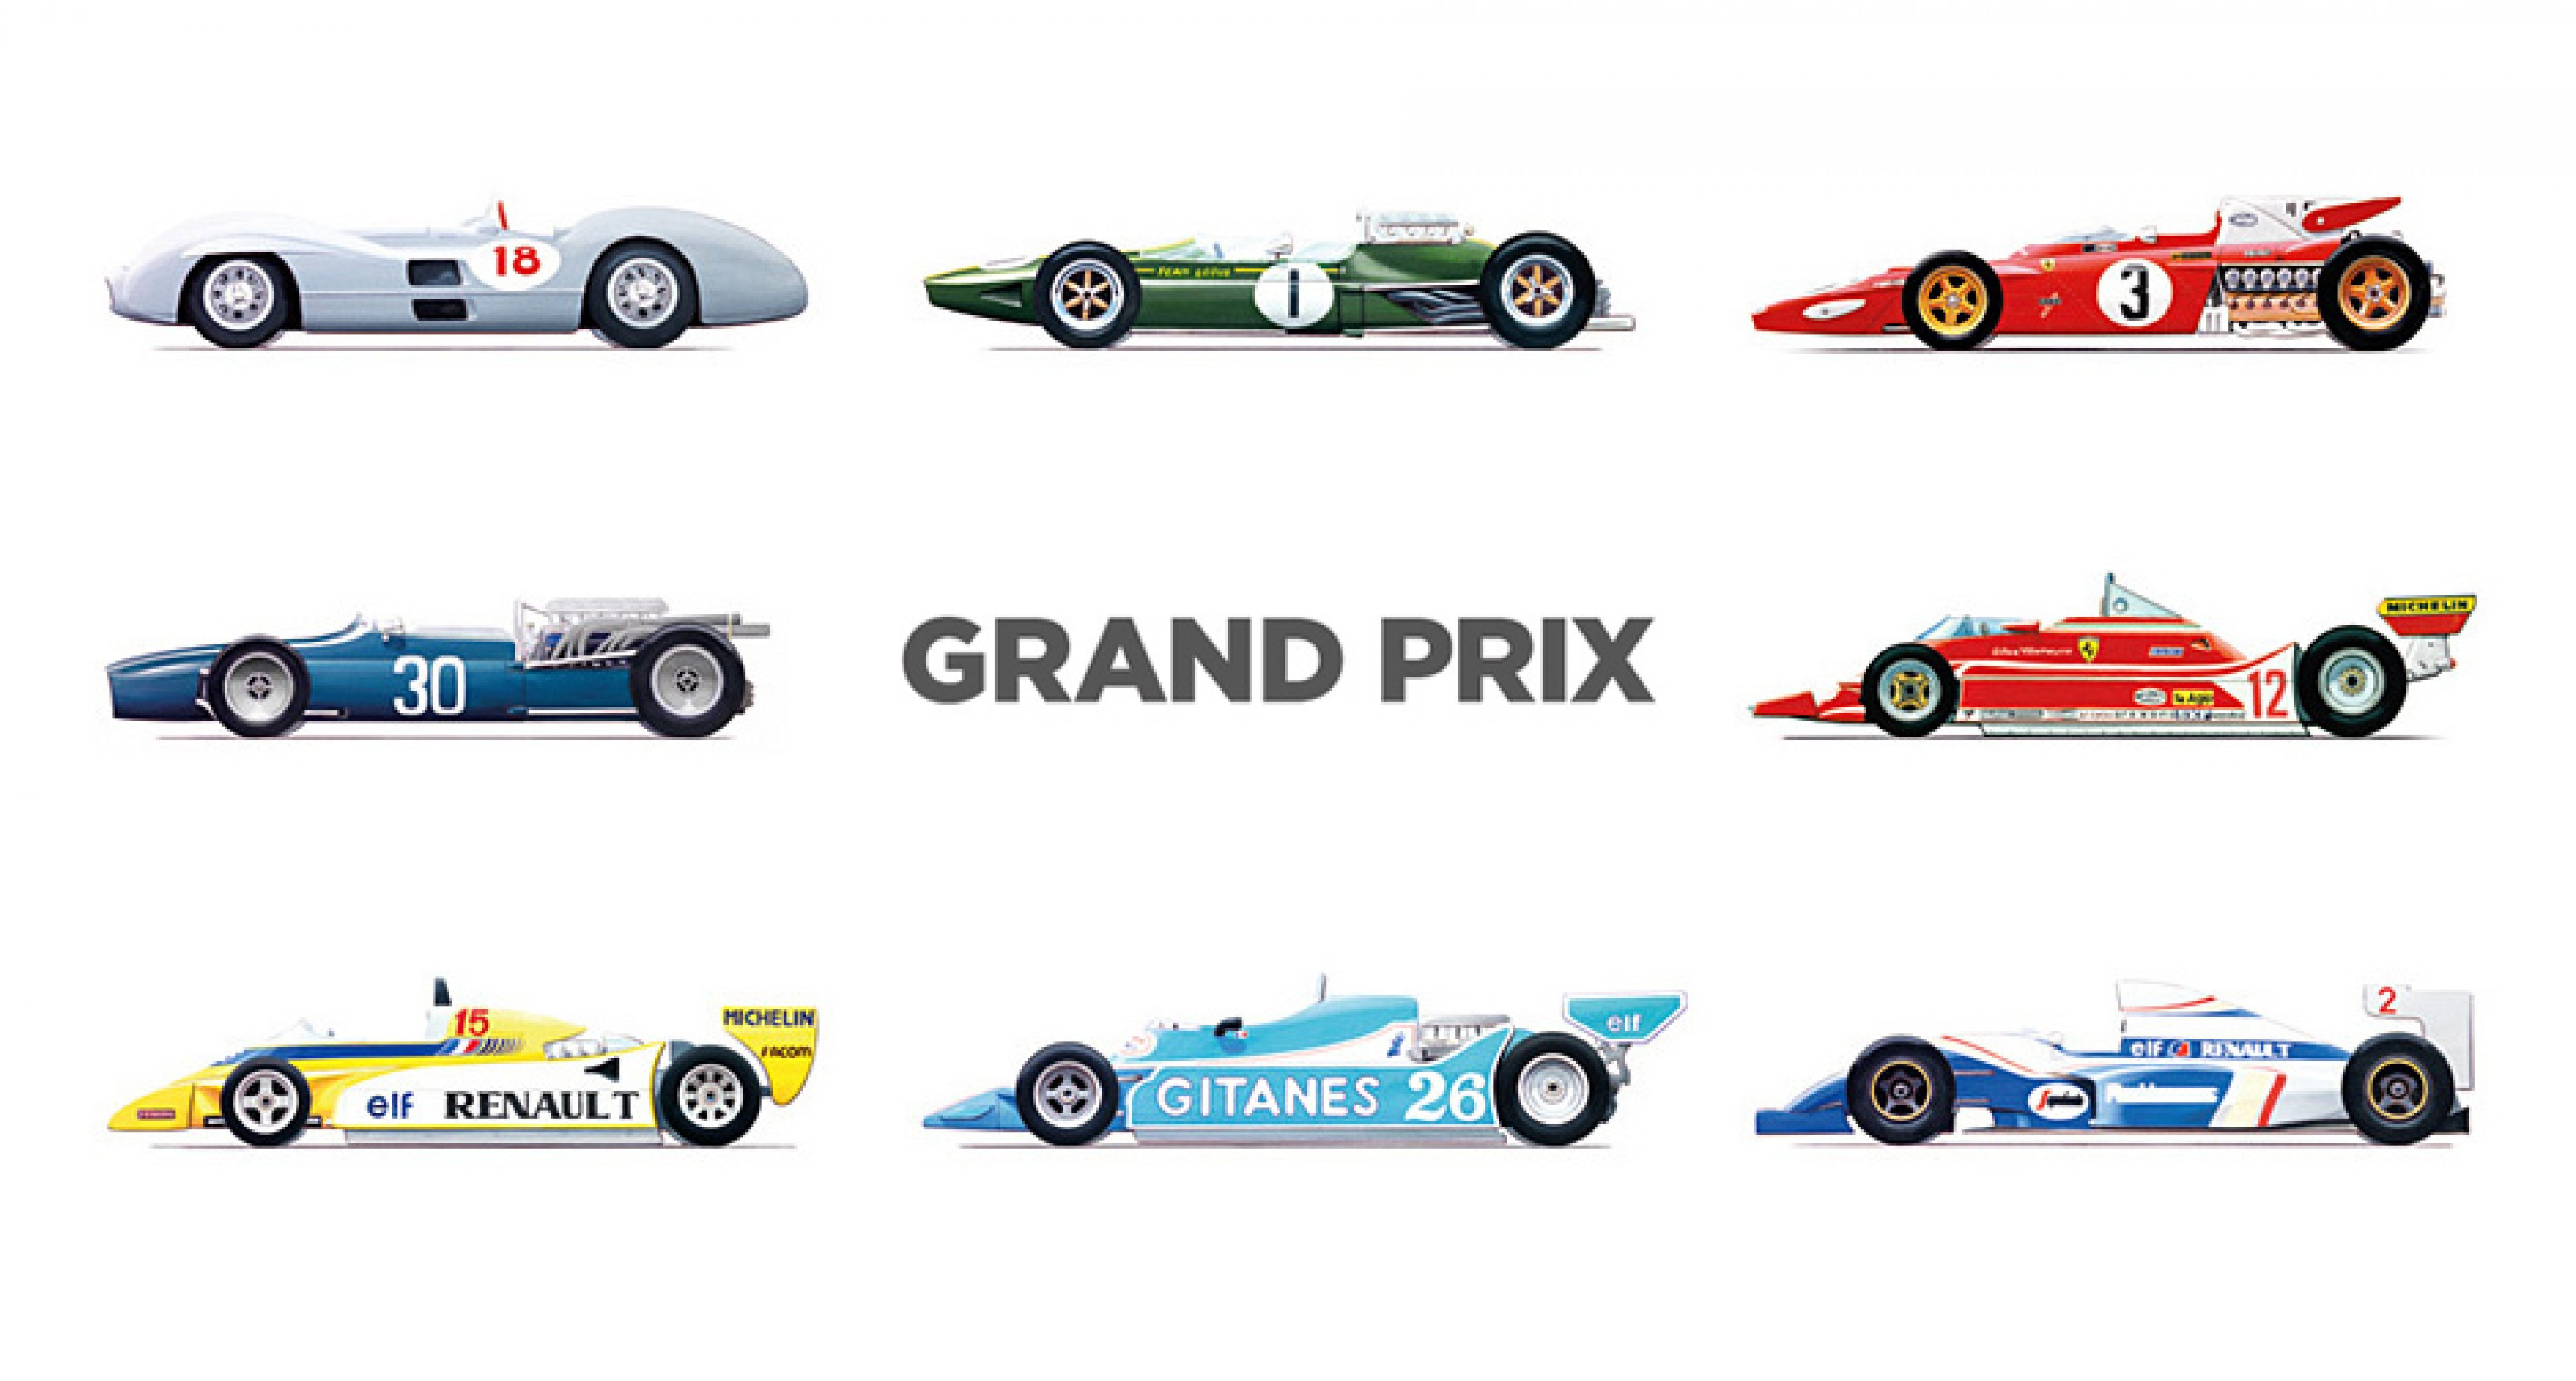 Grand Prix – The Formula One World Championship Single-Seaters